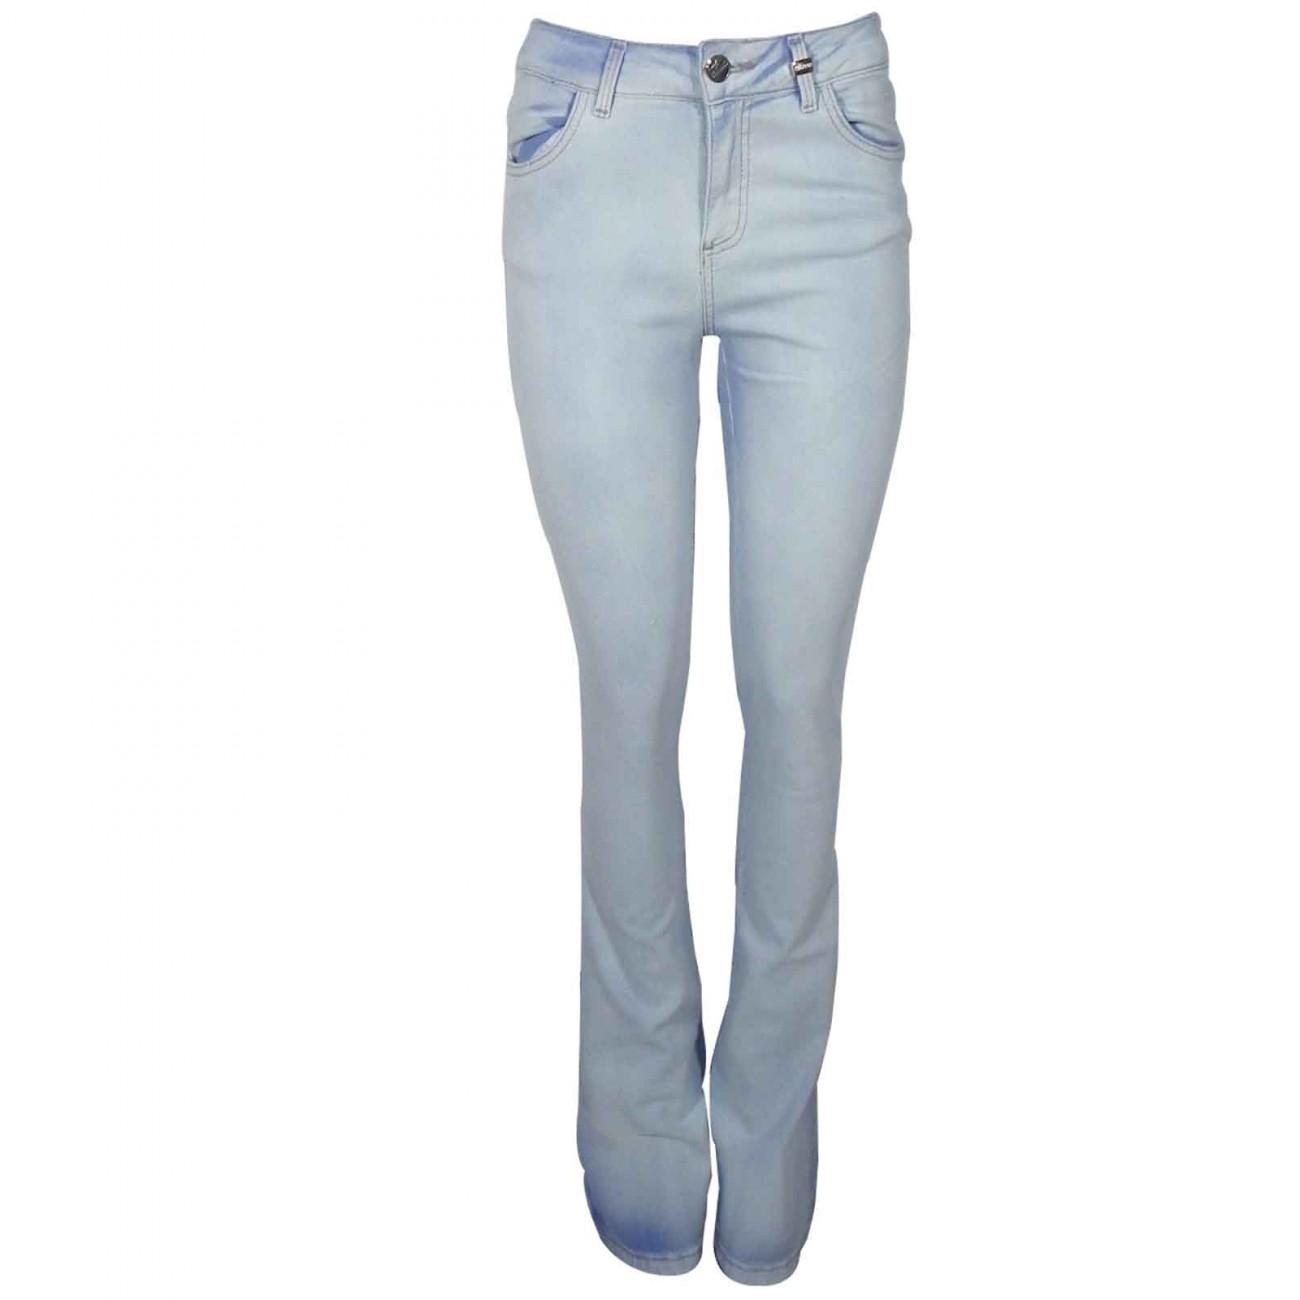 b16643c43 Calça Jeans Feminina Flare Cós Alto Chopper - Cor Jeans Claro - Pole ...